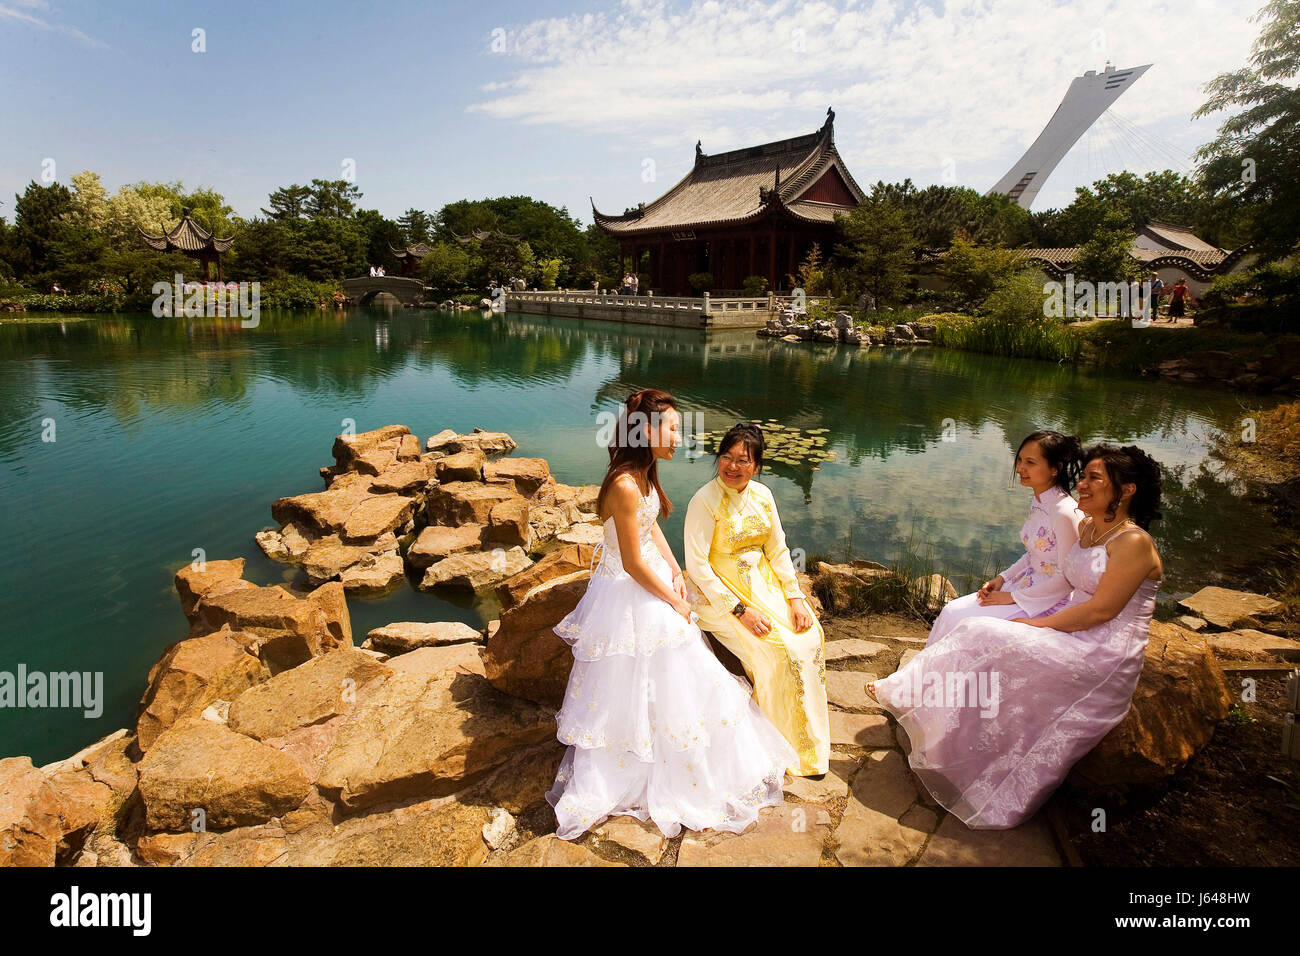 Mariee stock photos mariee stock images alamy for Au jardin les amis singapore botanic gardens